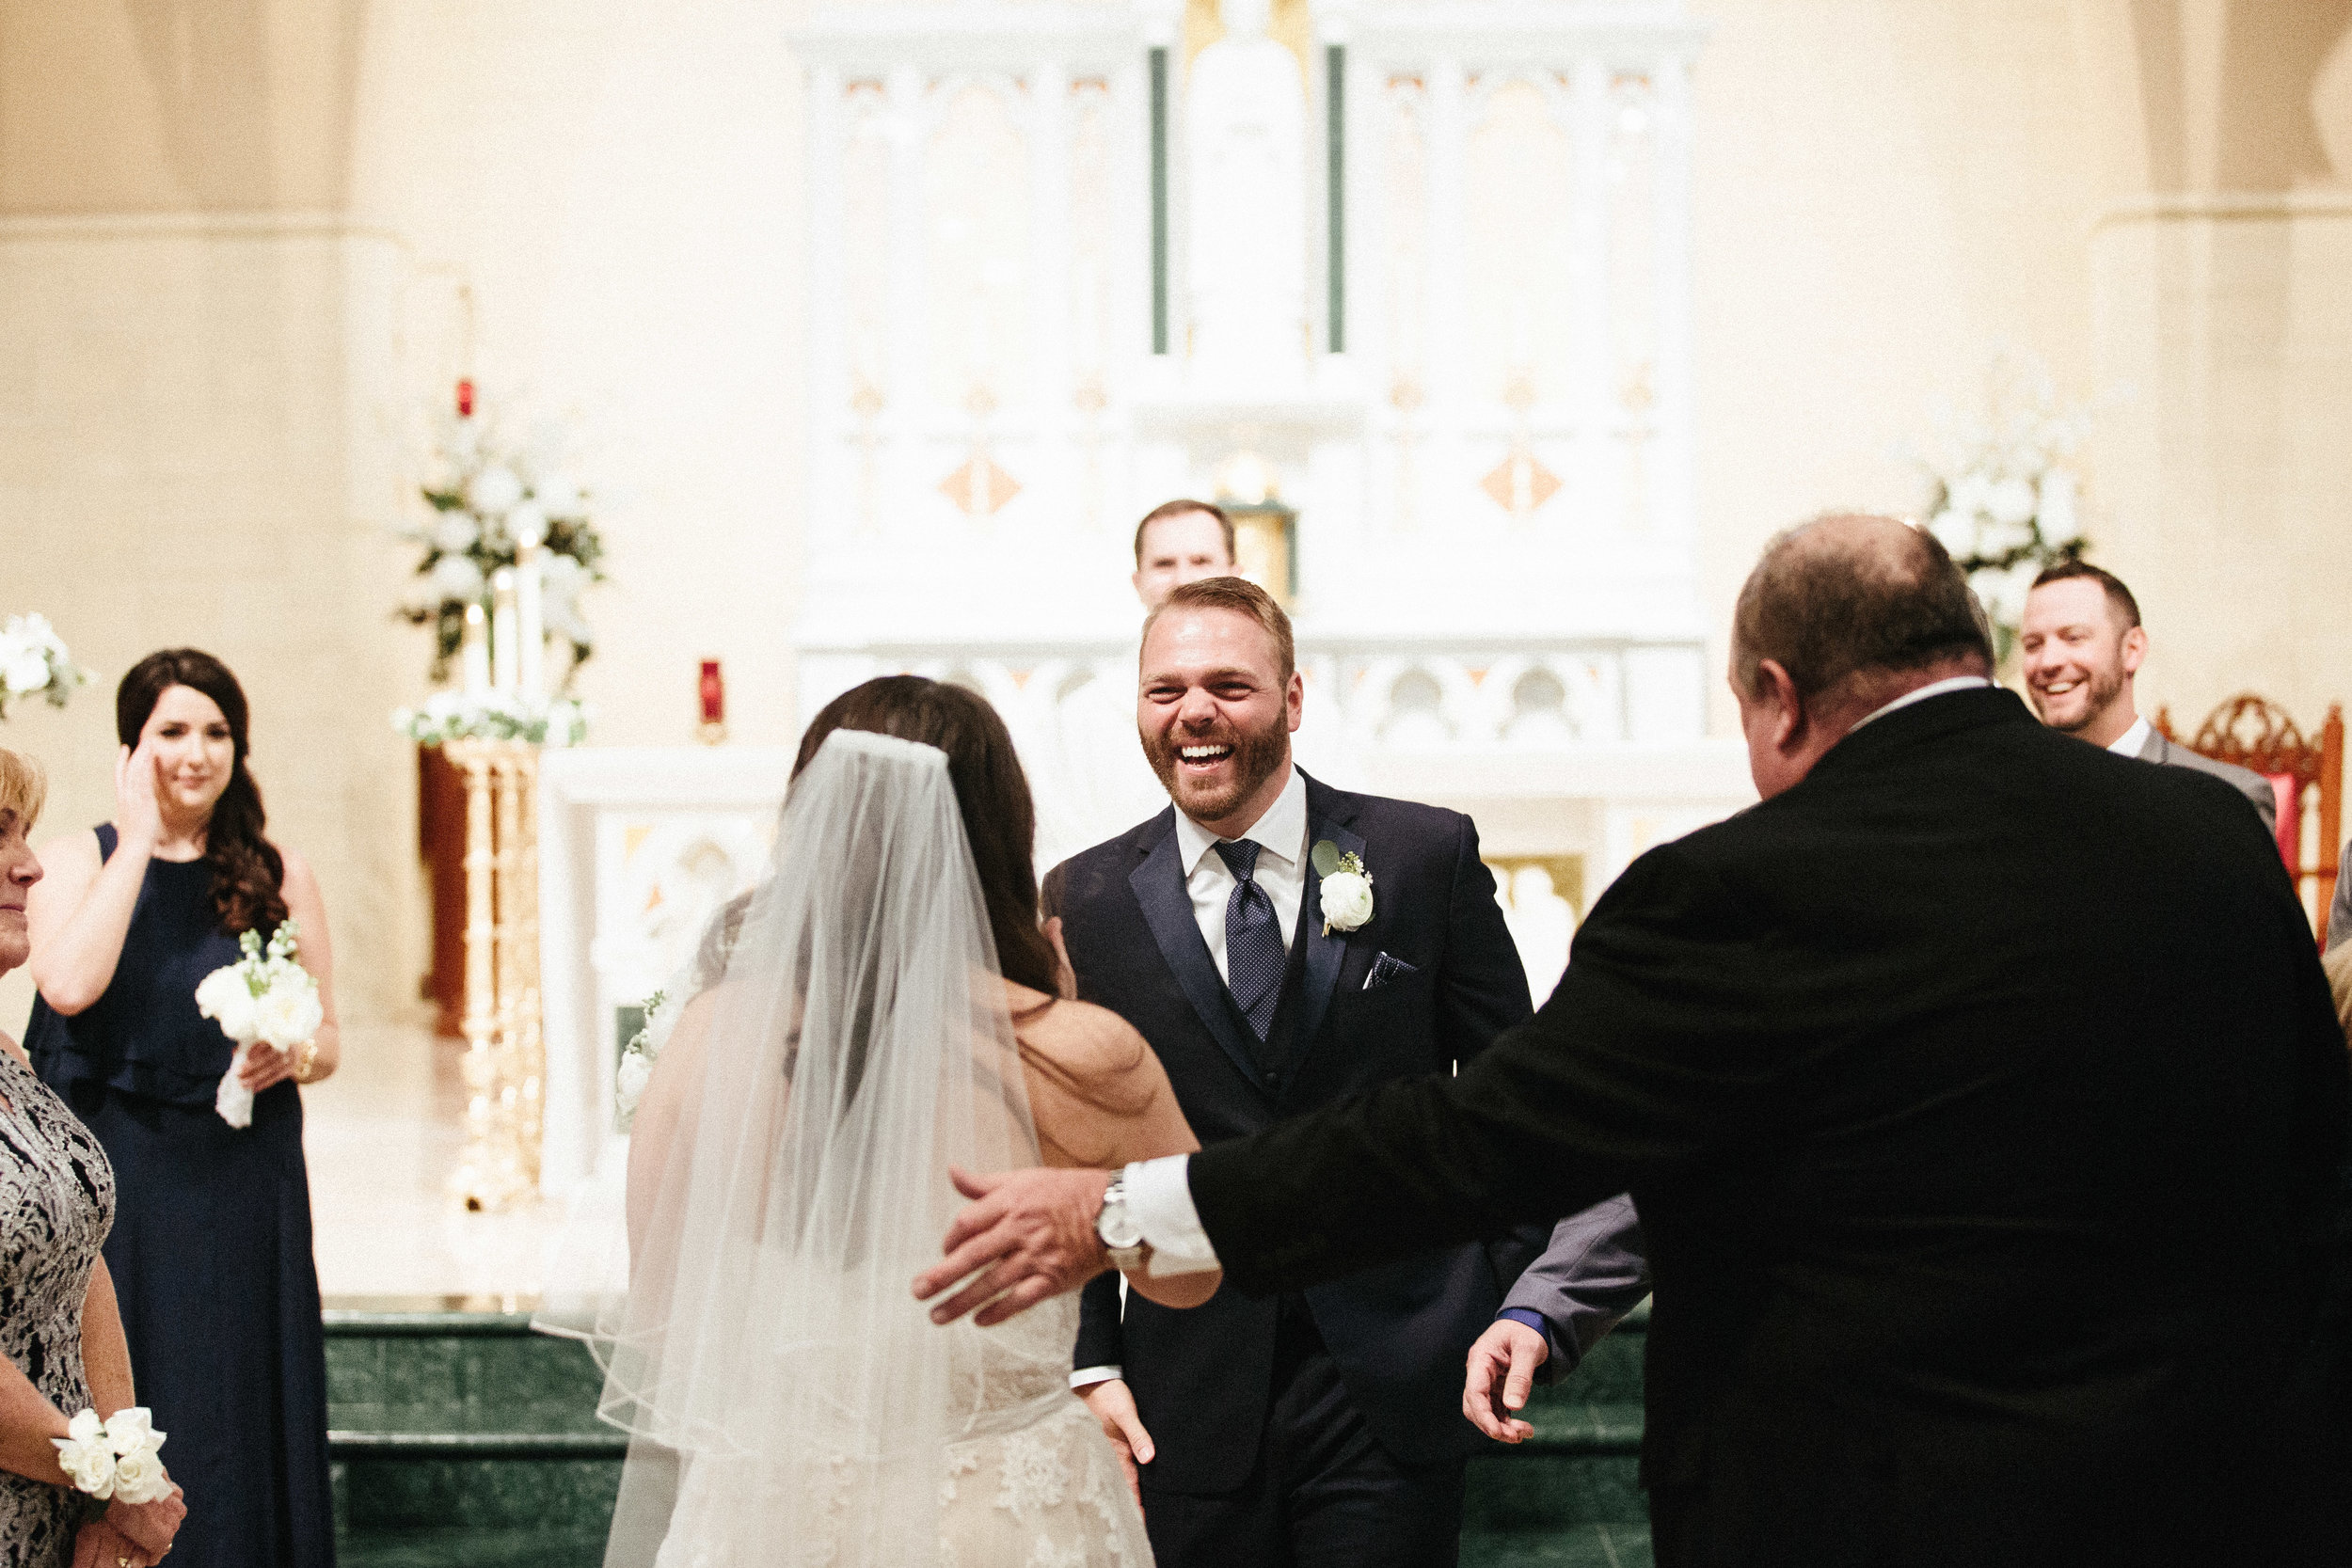 roswell_st_peter_chanel_catholic_avalon_hotel_alpharetta_wedding-1455.jpg